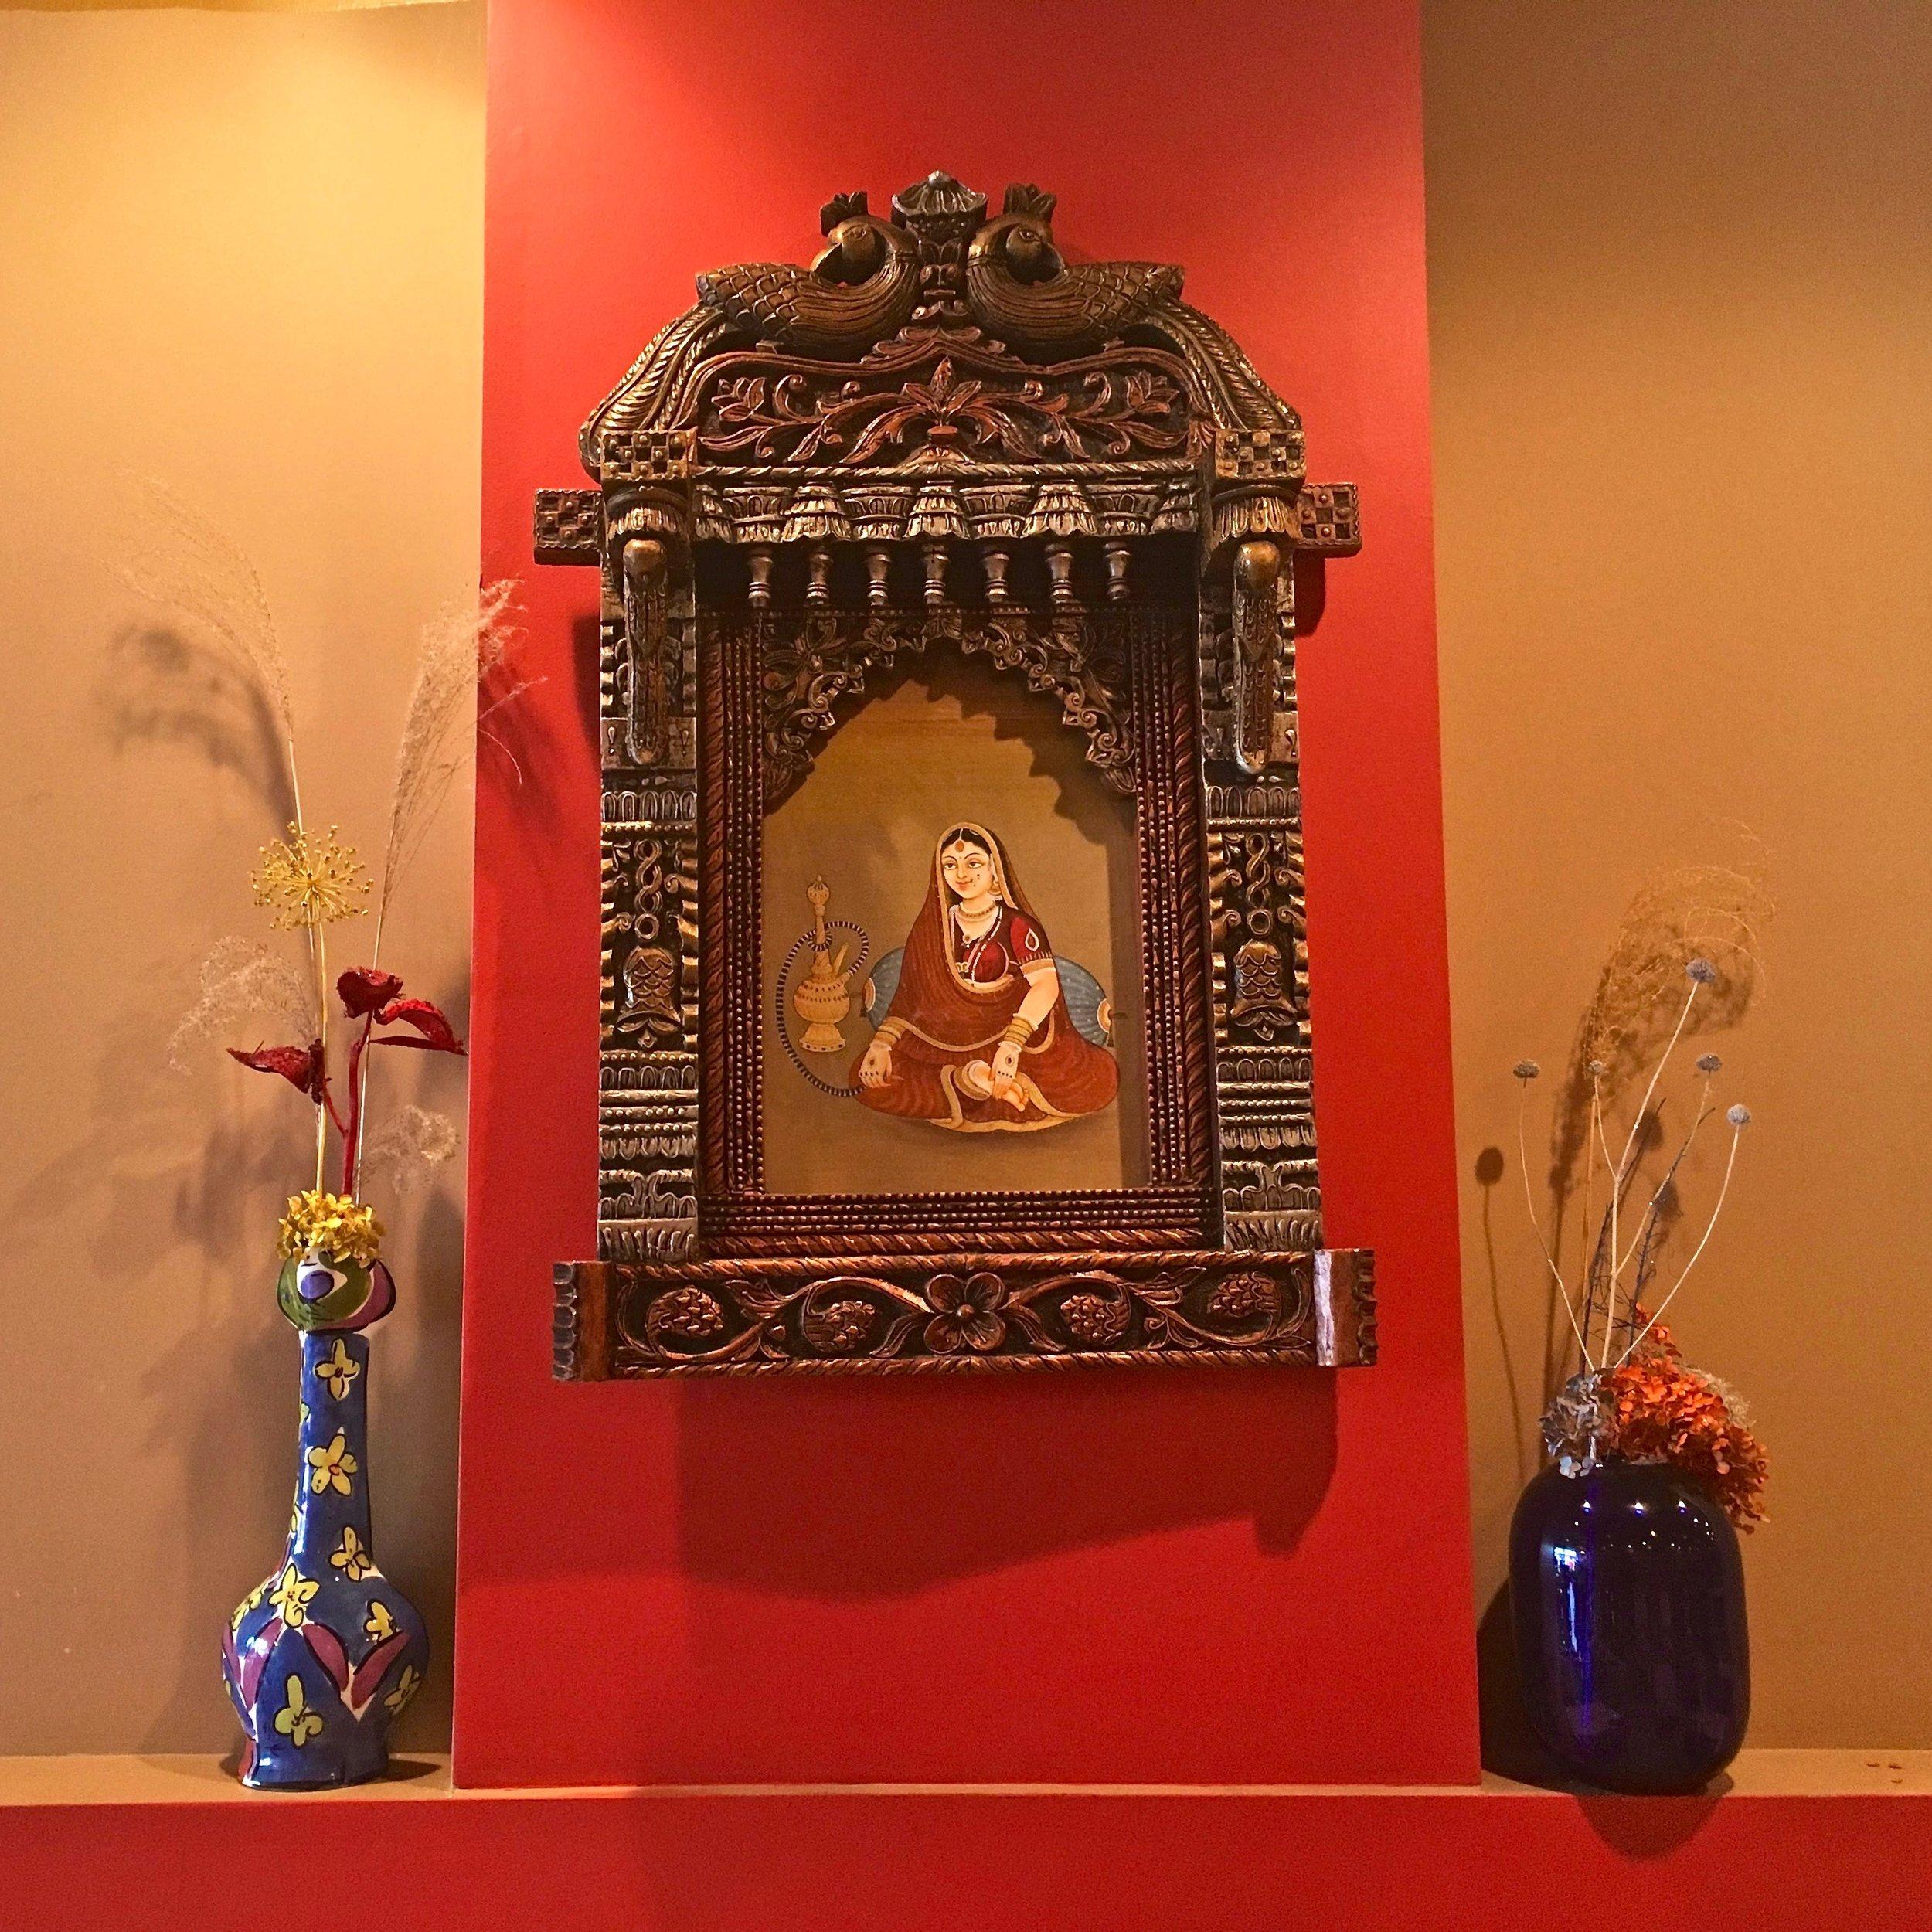 Hema's Kitchen women owned Indian food restaurant